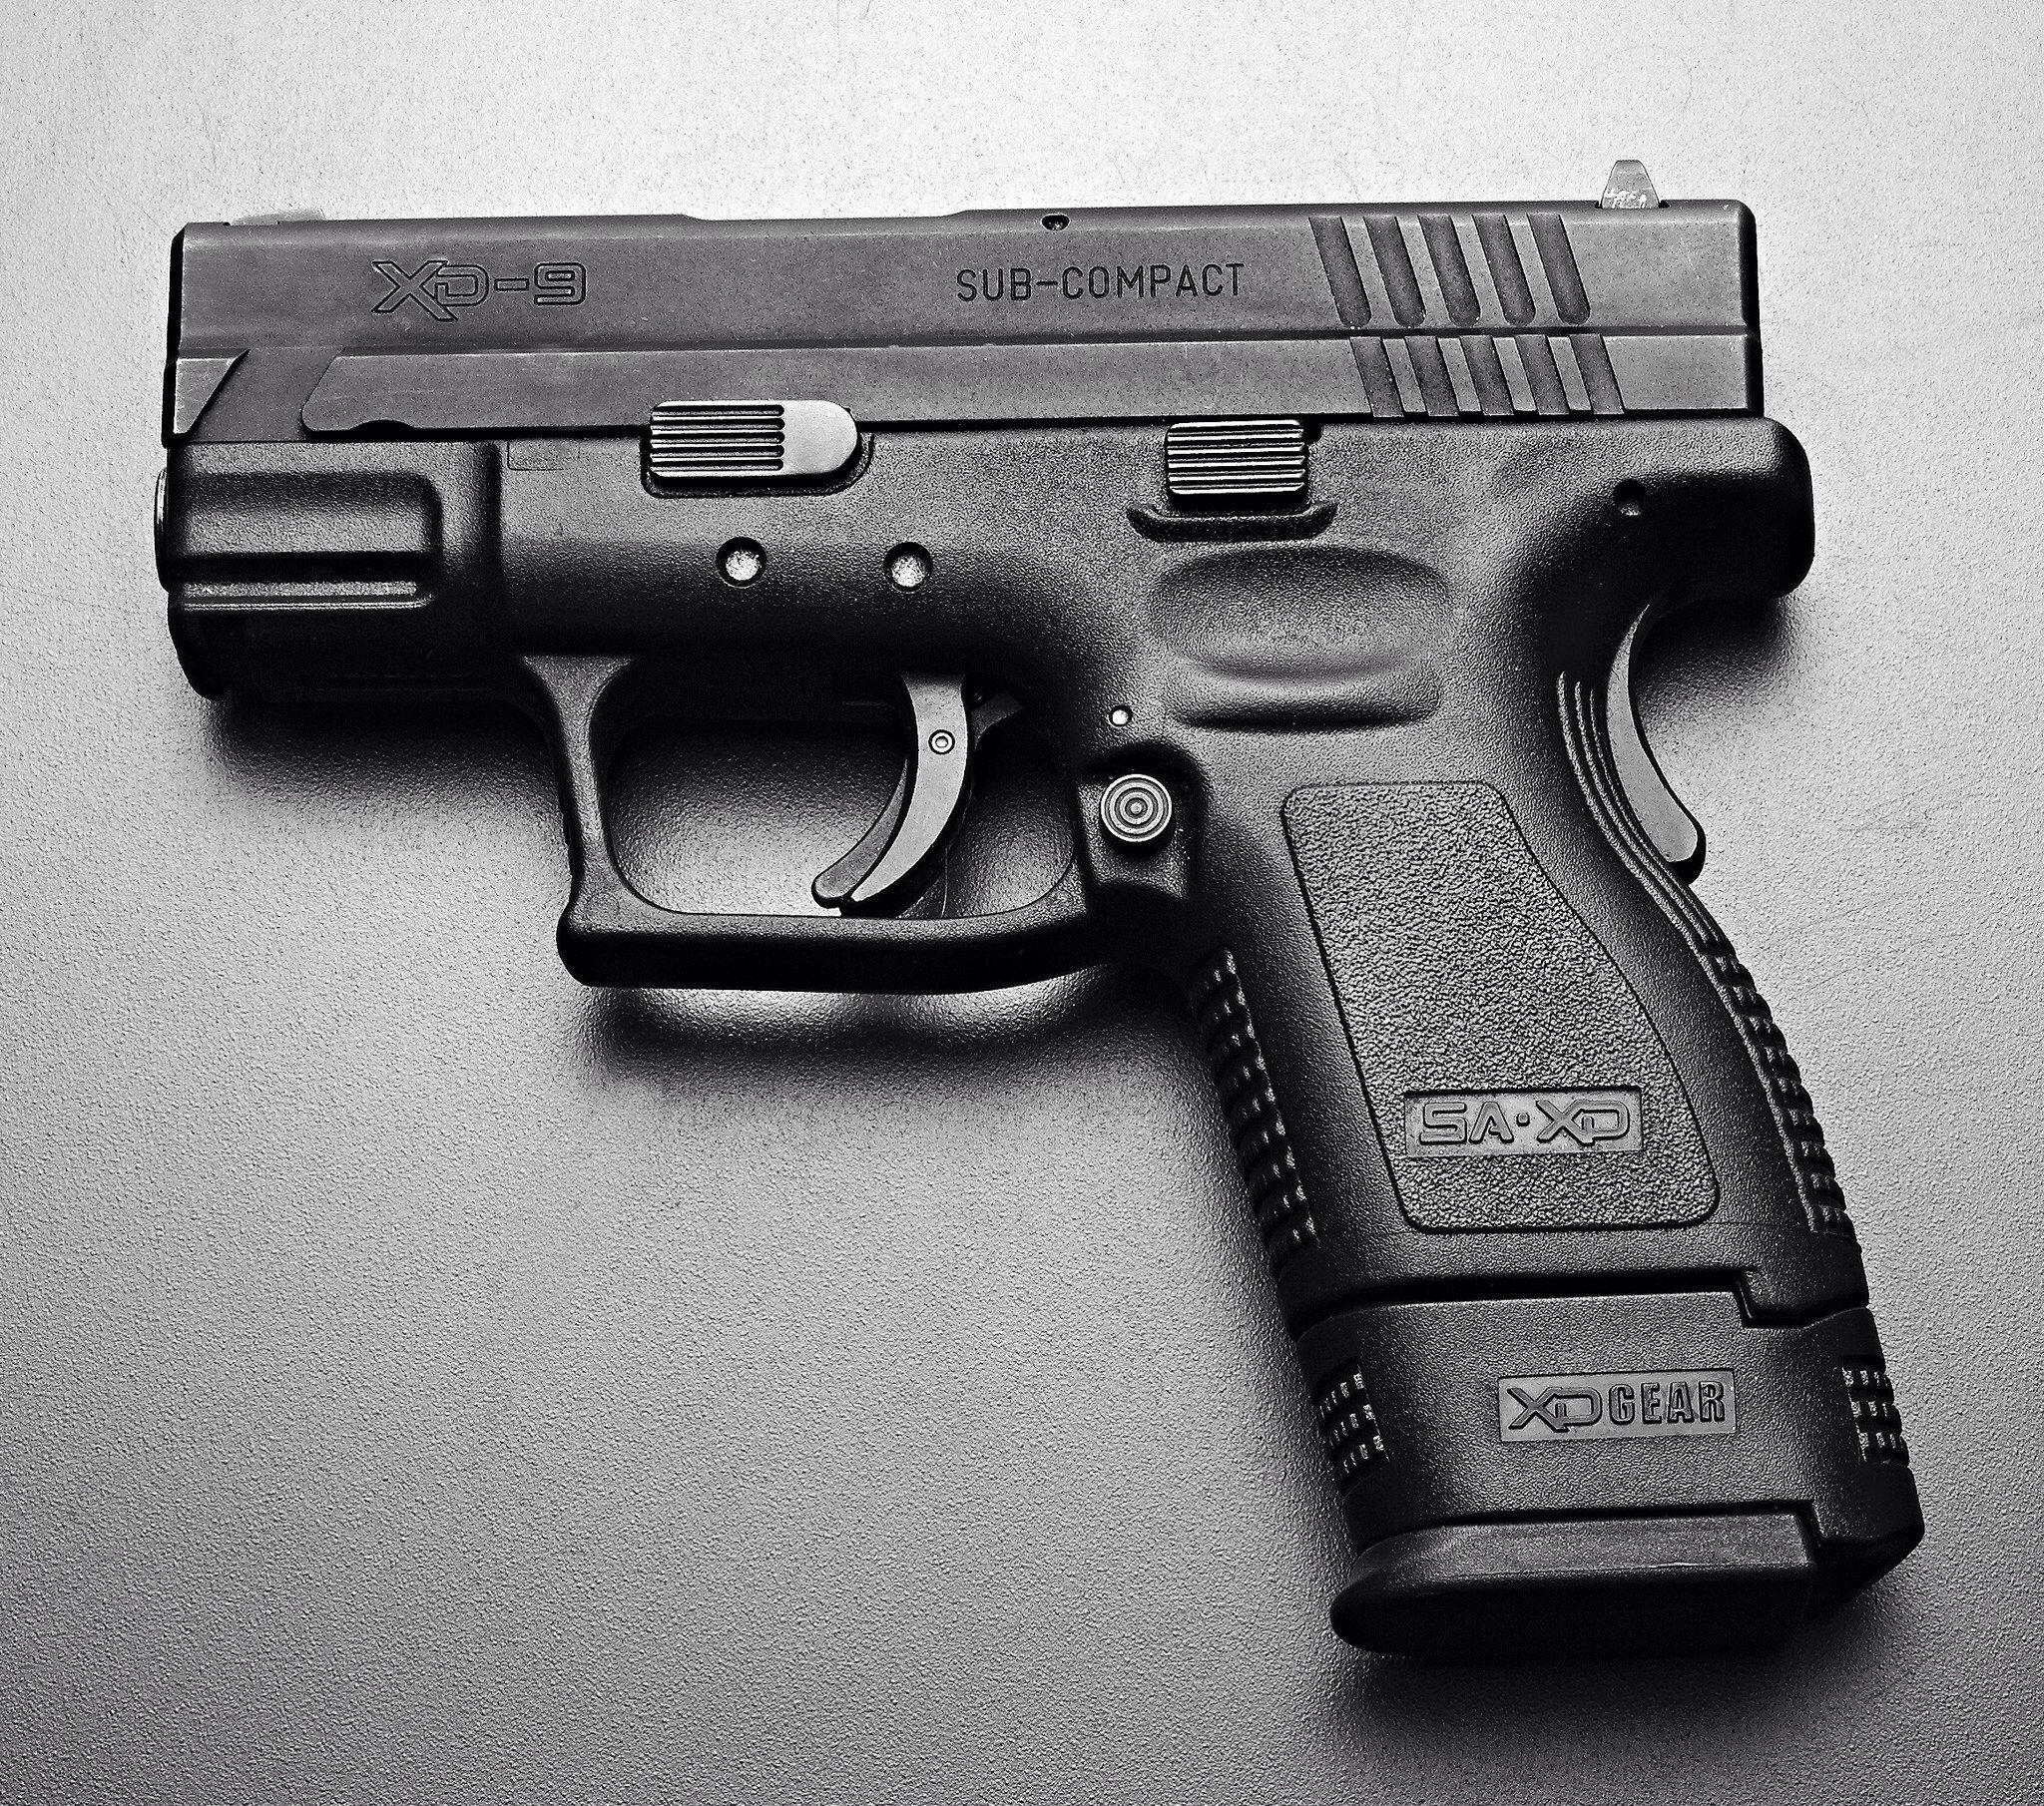 Springfield Armory XD 9mm Sub Compact handgun | Freedom | Pinterest ...